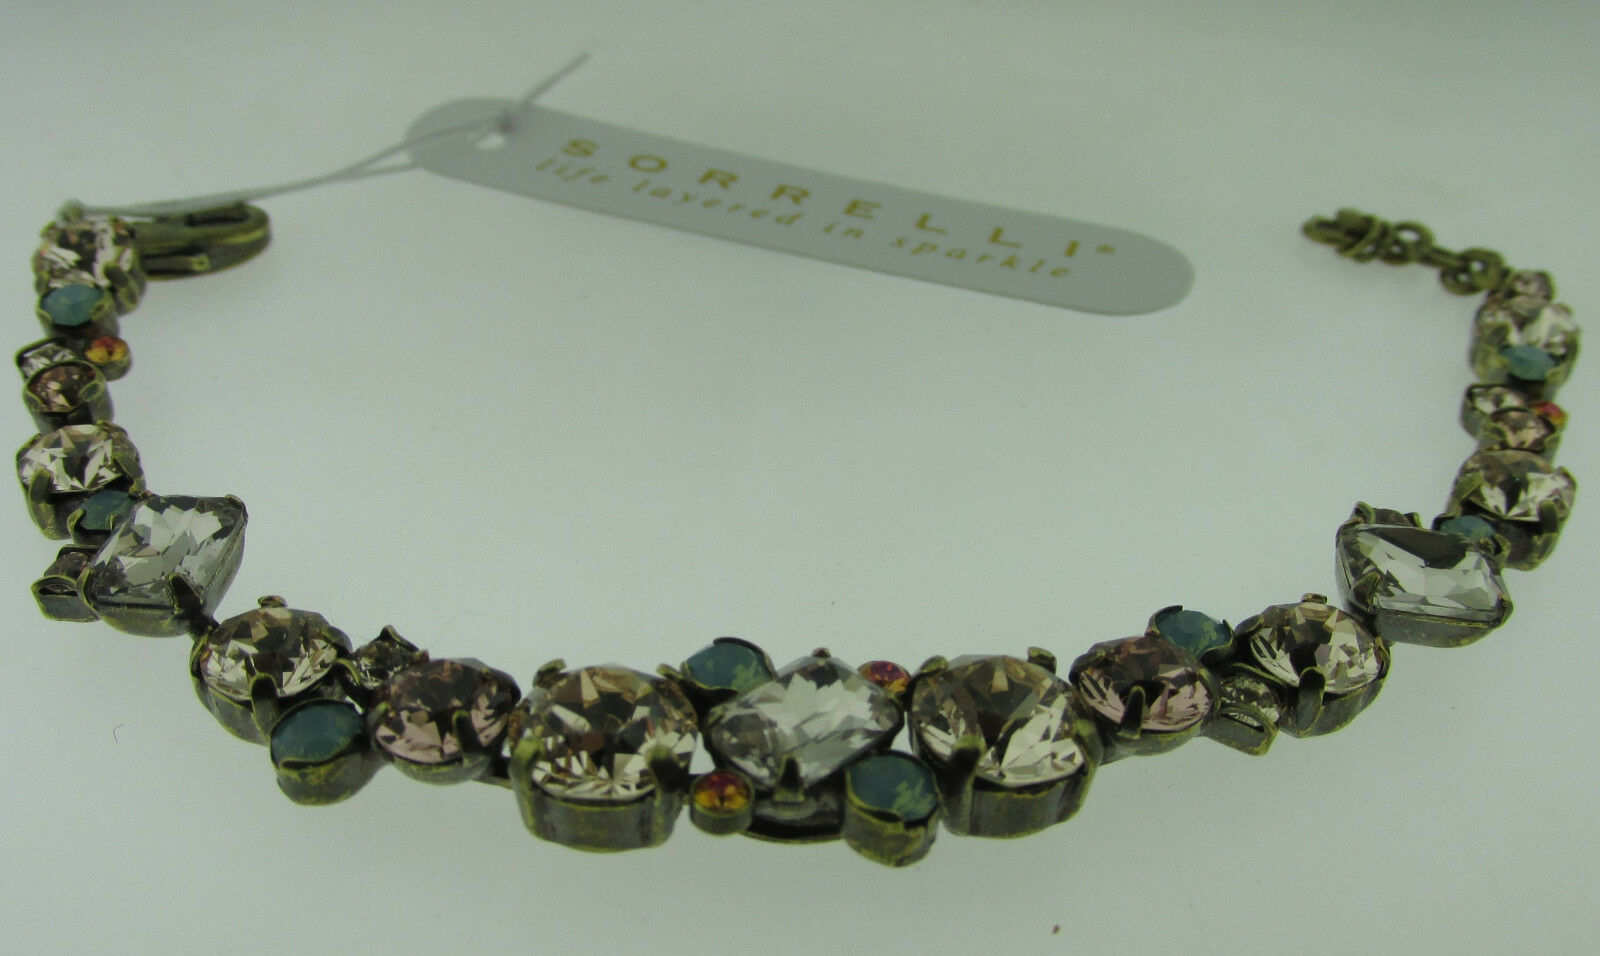 Sorrelli Apricot Agate BDG46AGAP Bracelet  Antique gold tone